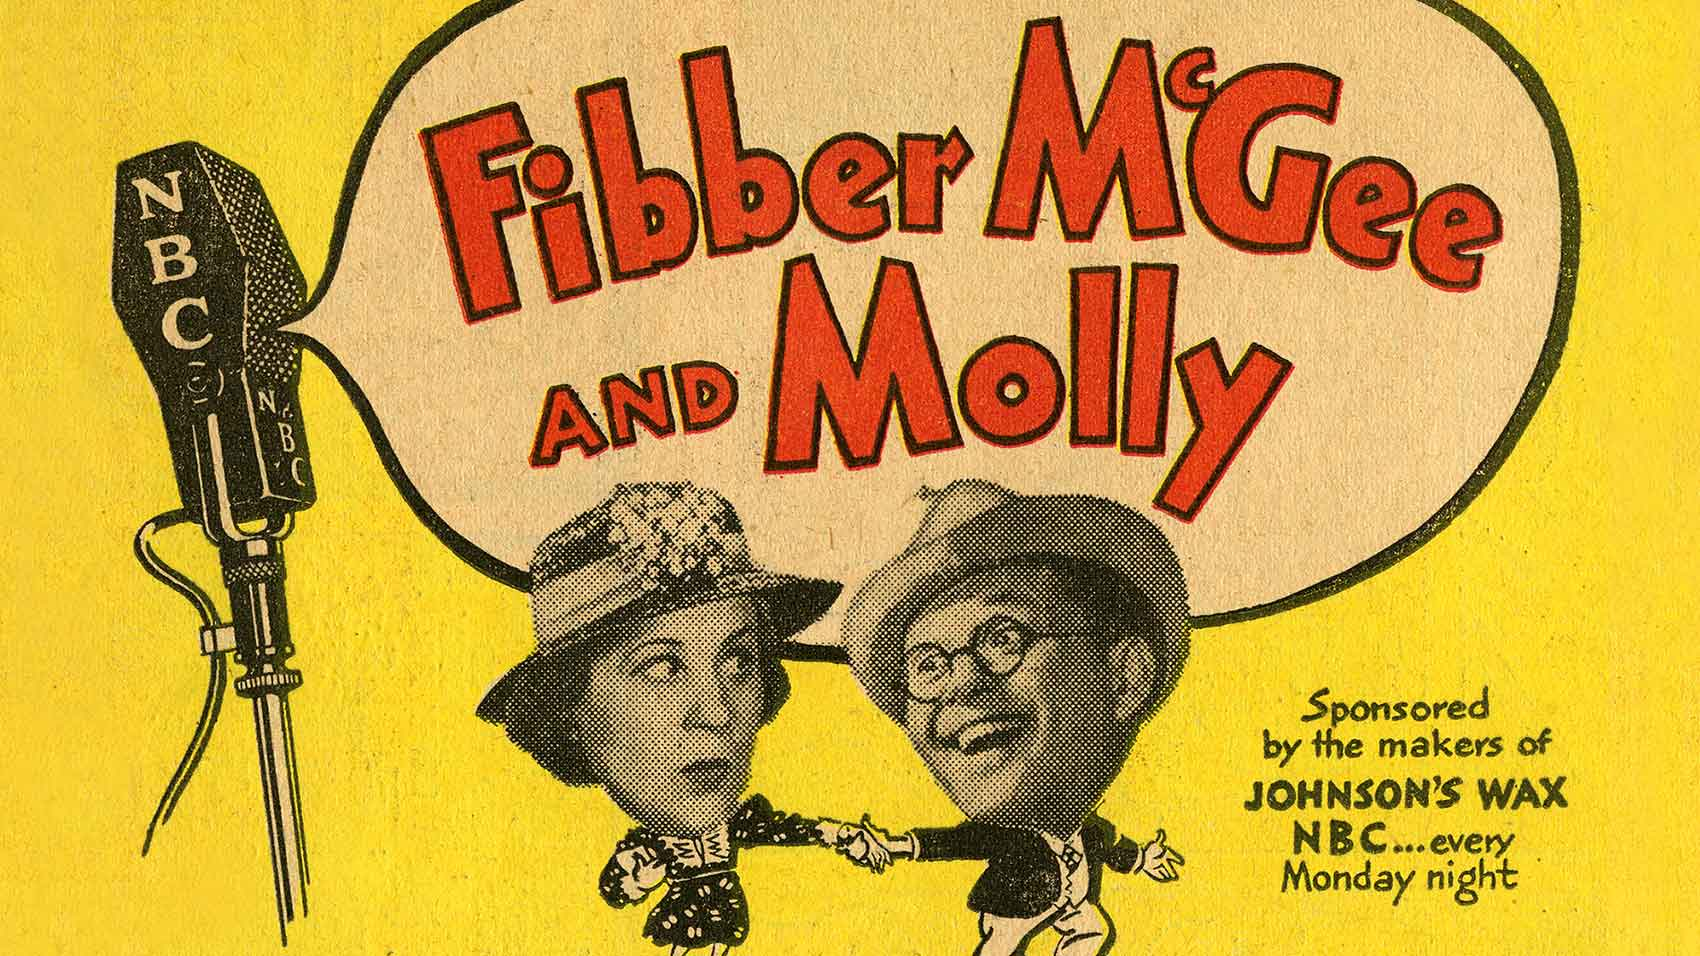 "De radioadvertentie in de komedieklassieker ""Fibber McGee and Molly""."